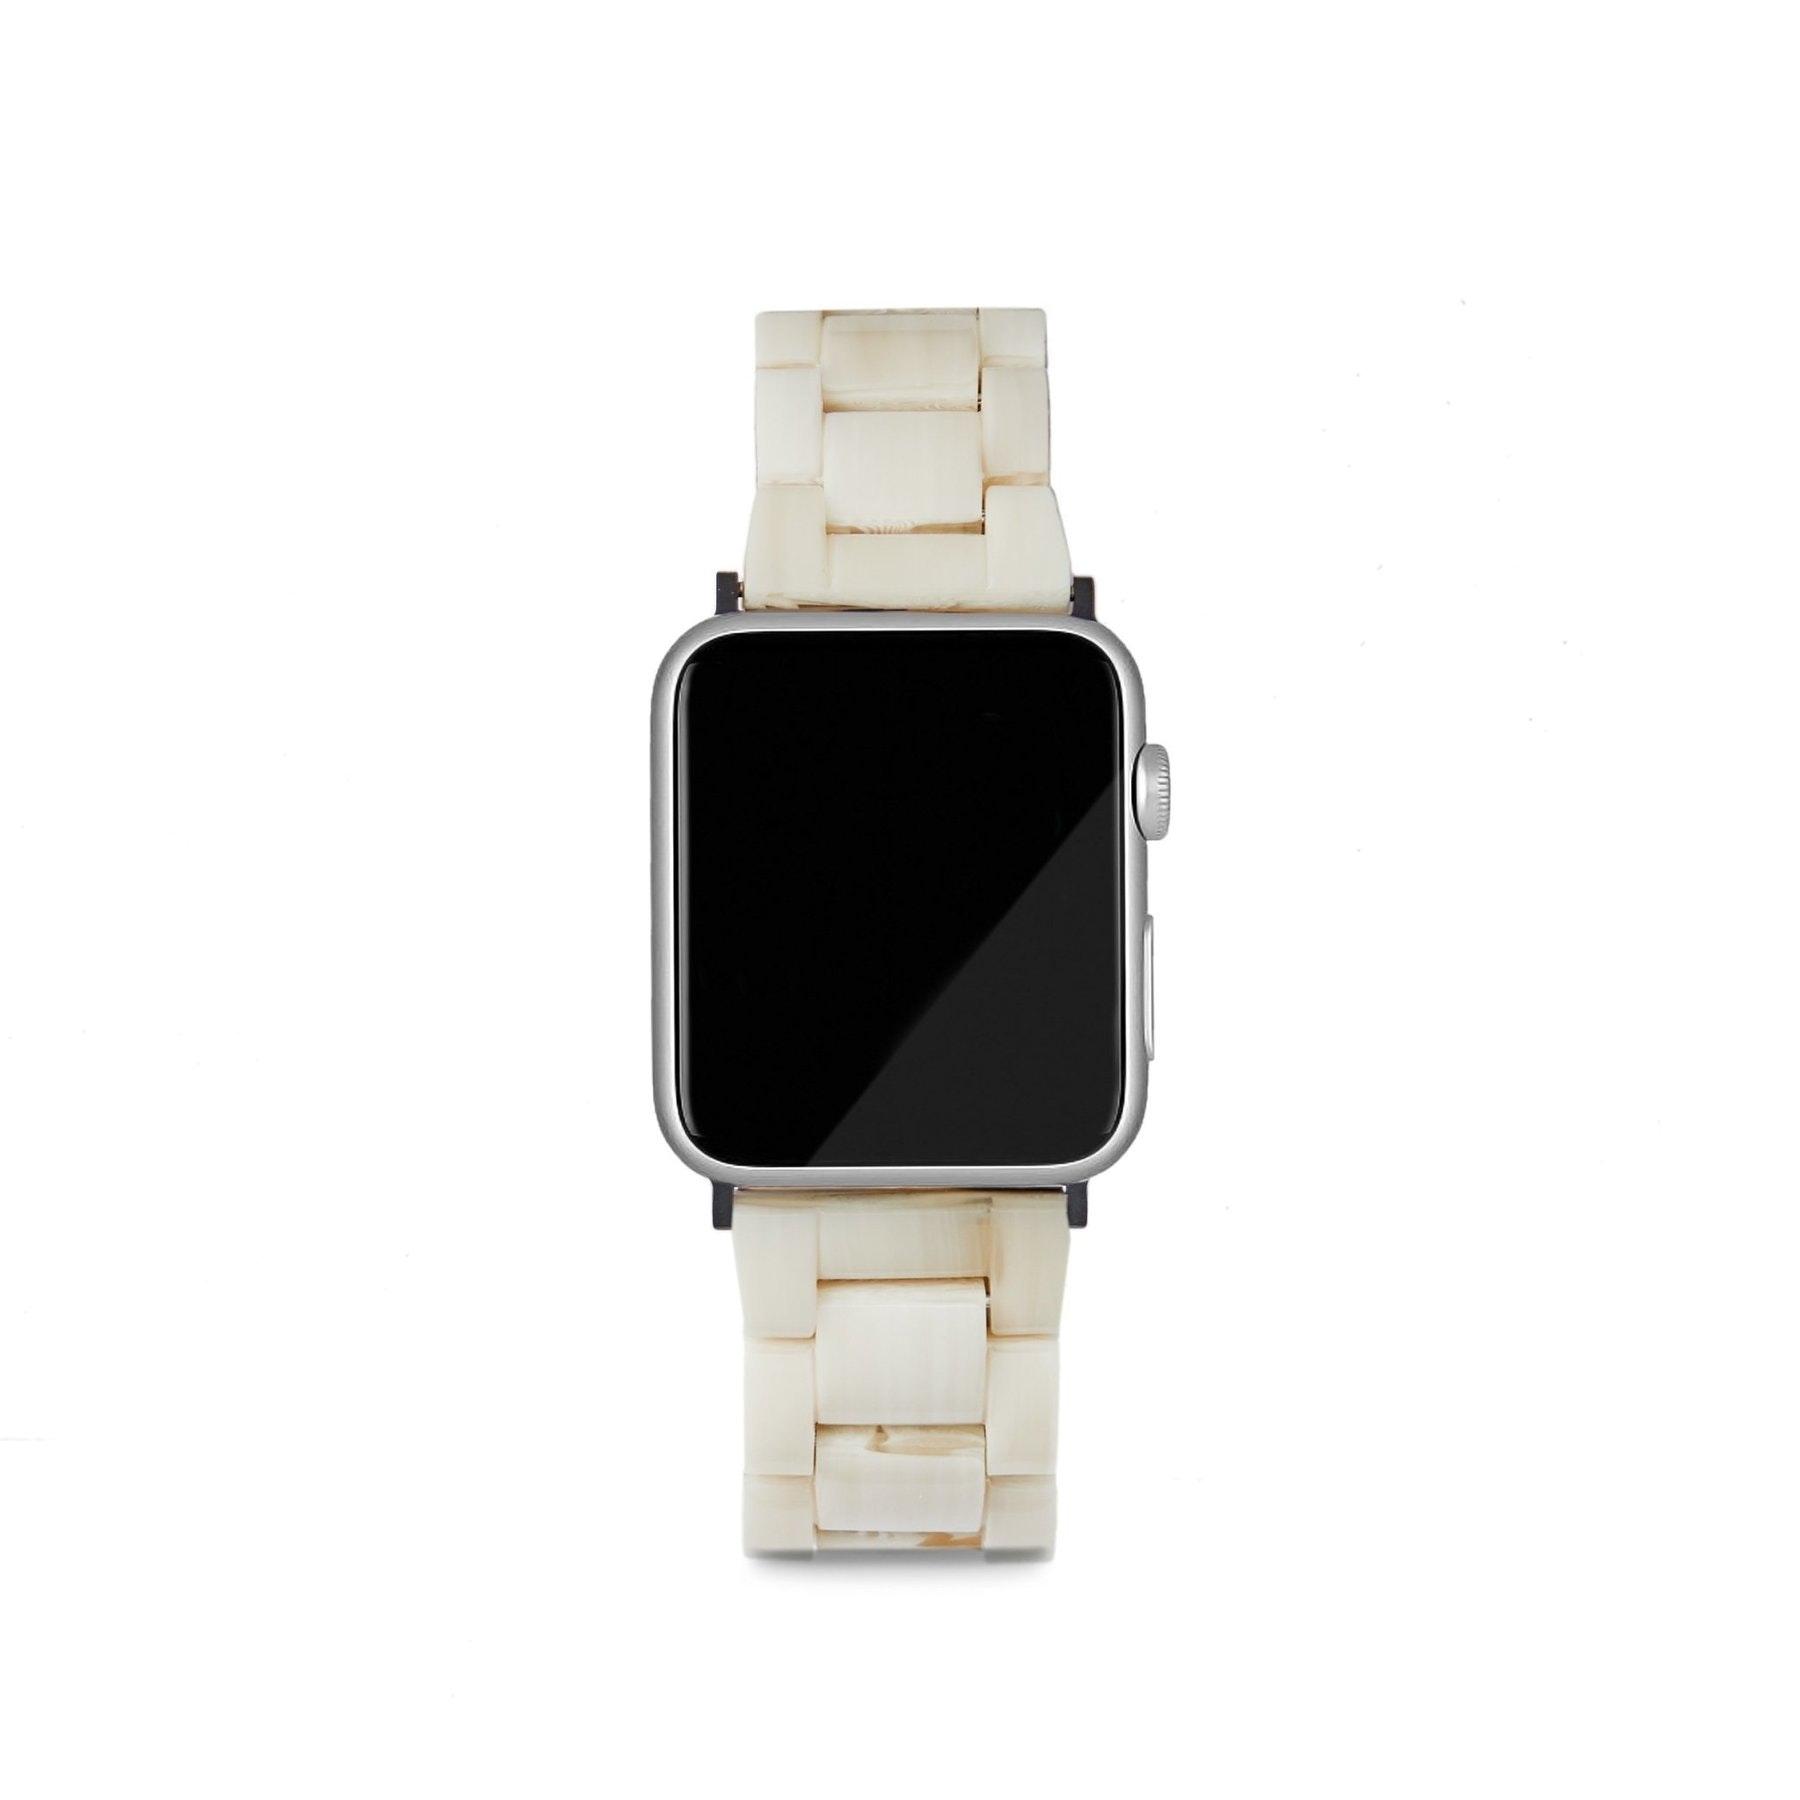 Machete Apple Watch Bands